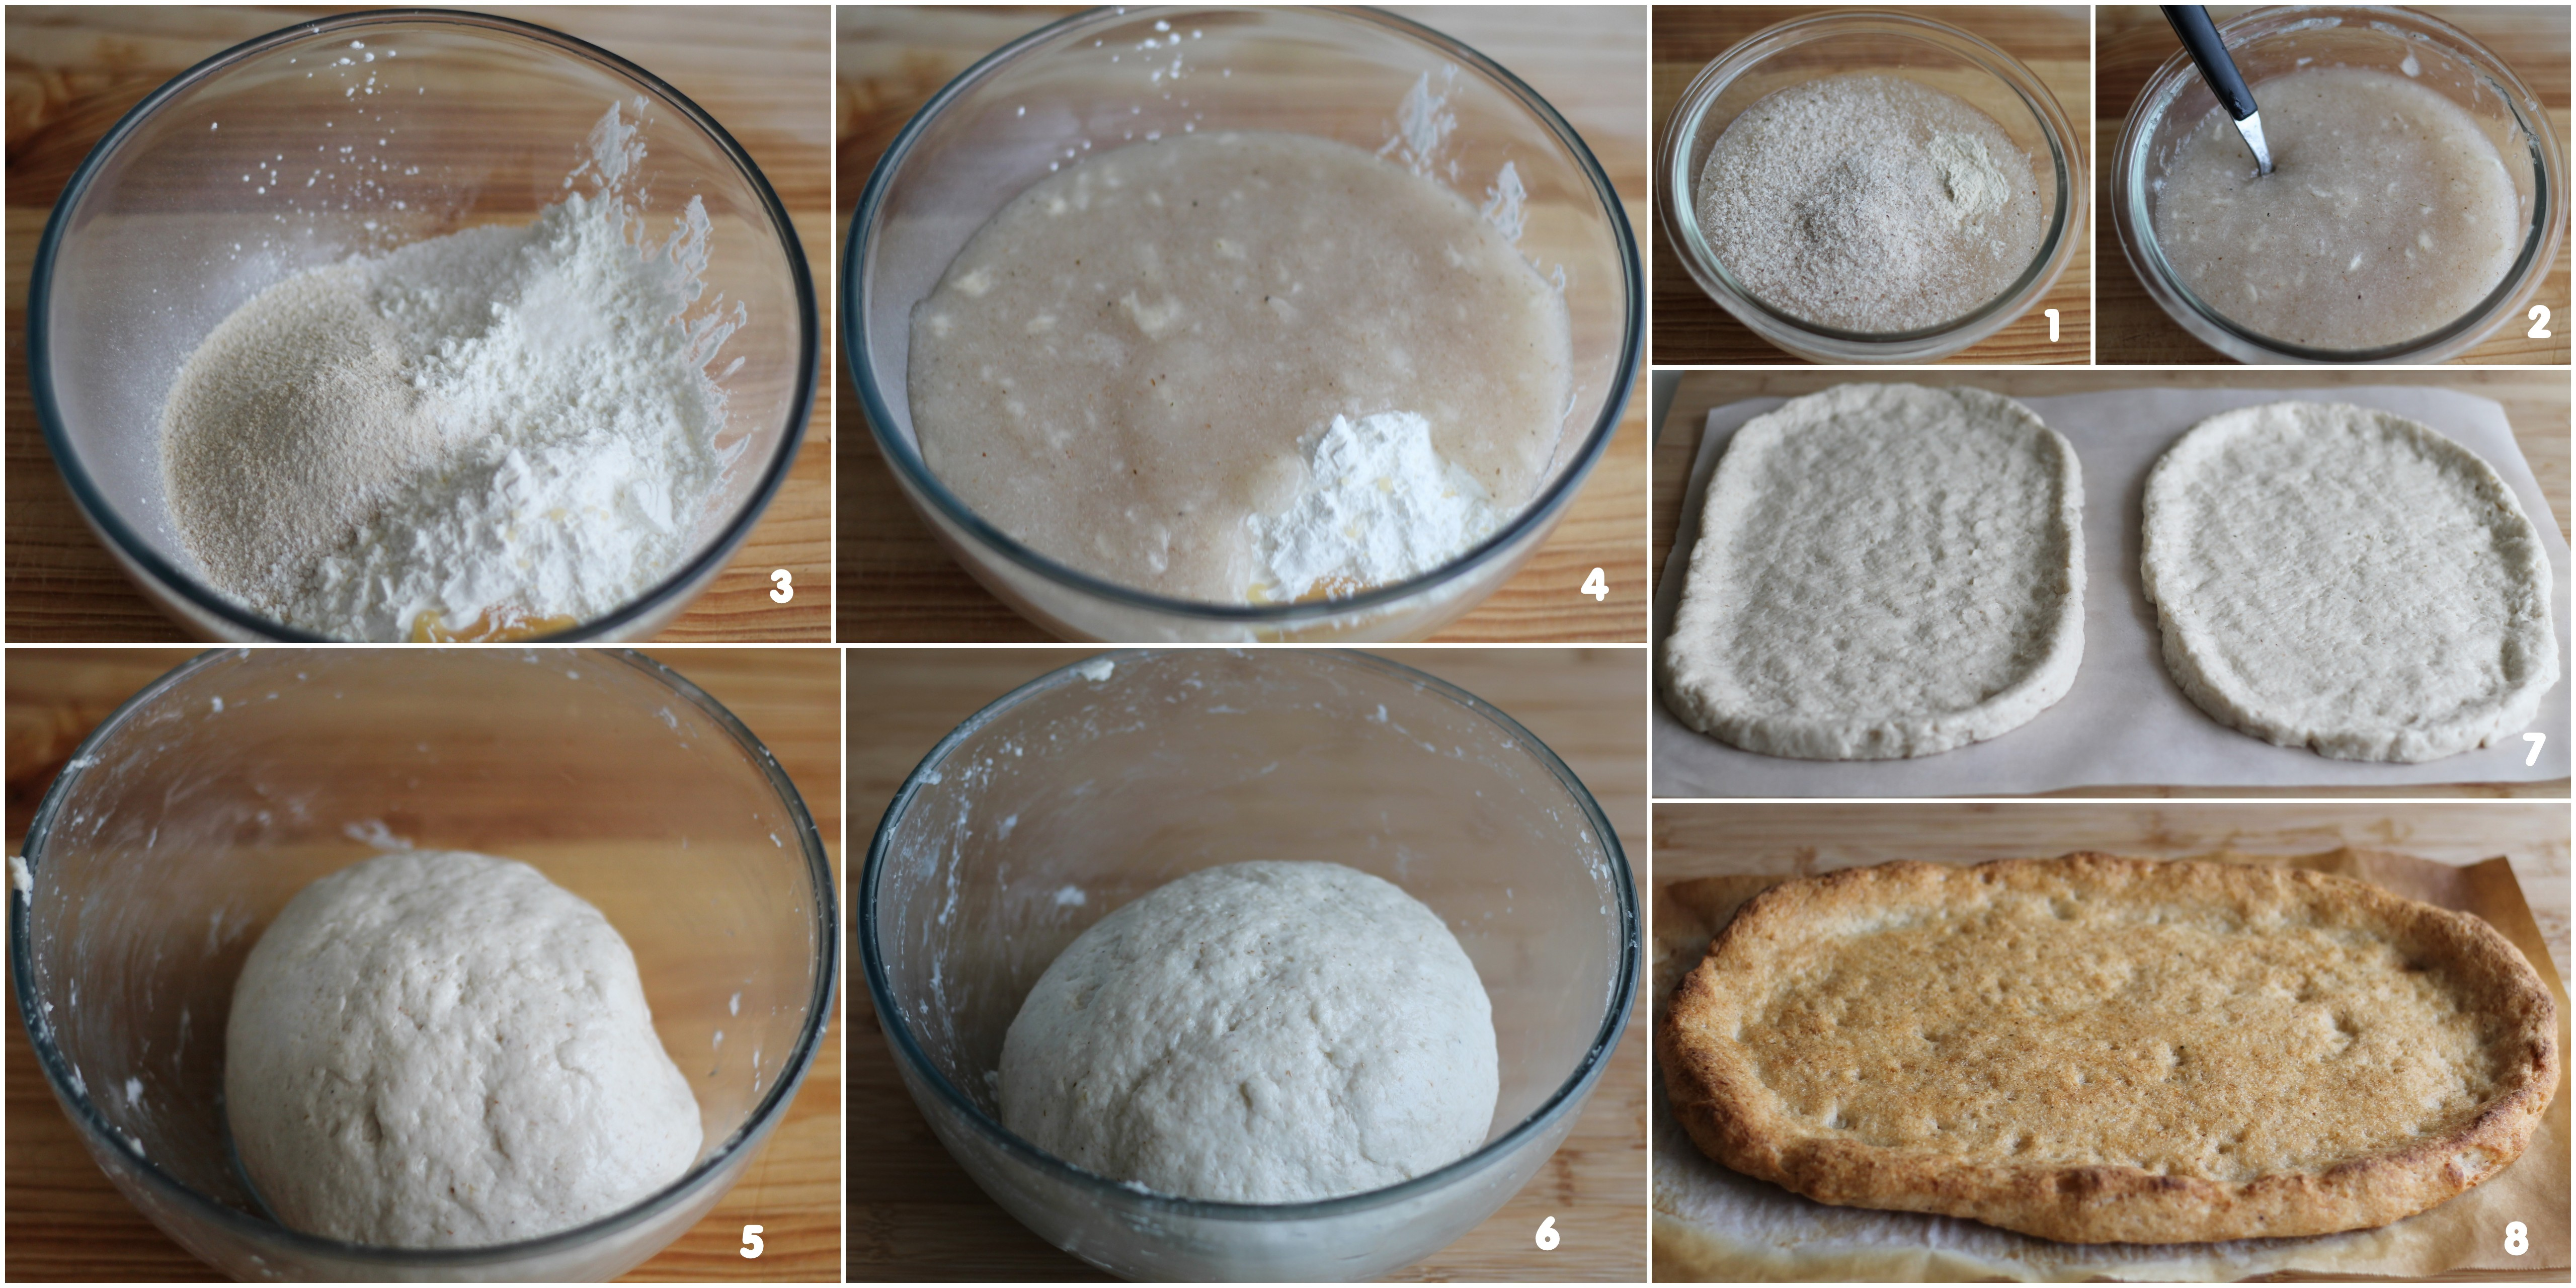 Pizza senza glutine, senza lattosio - La Cassata Celiaca